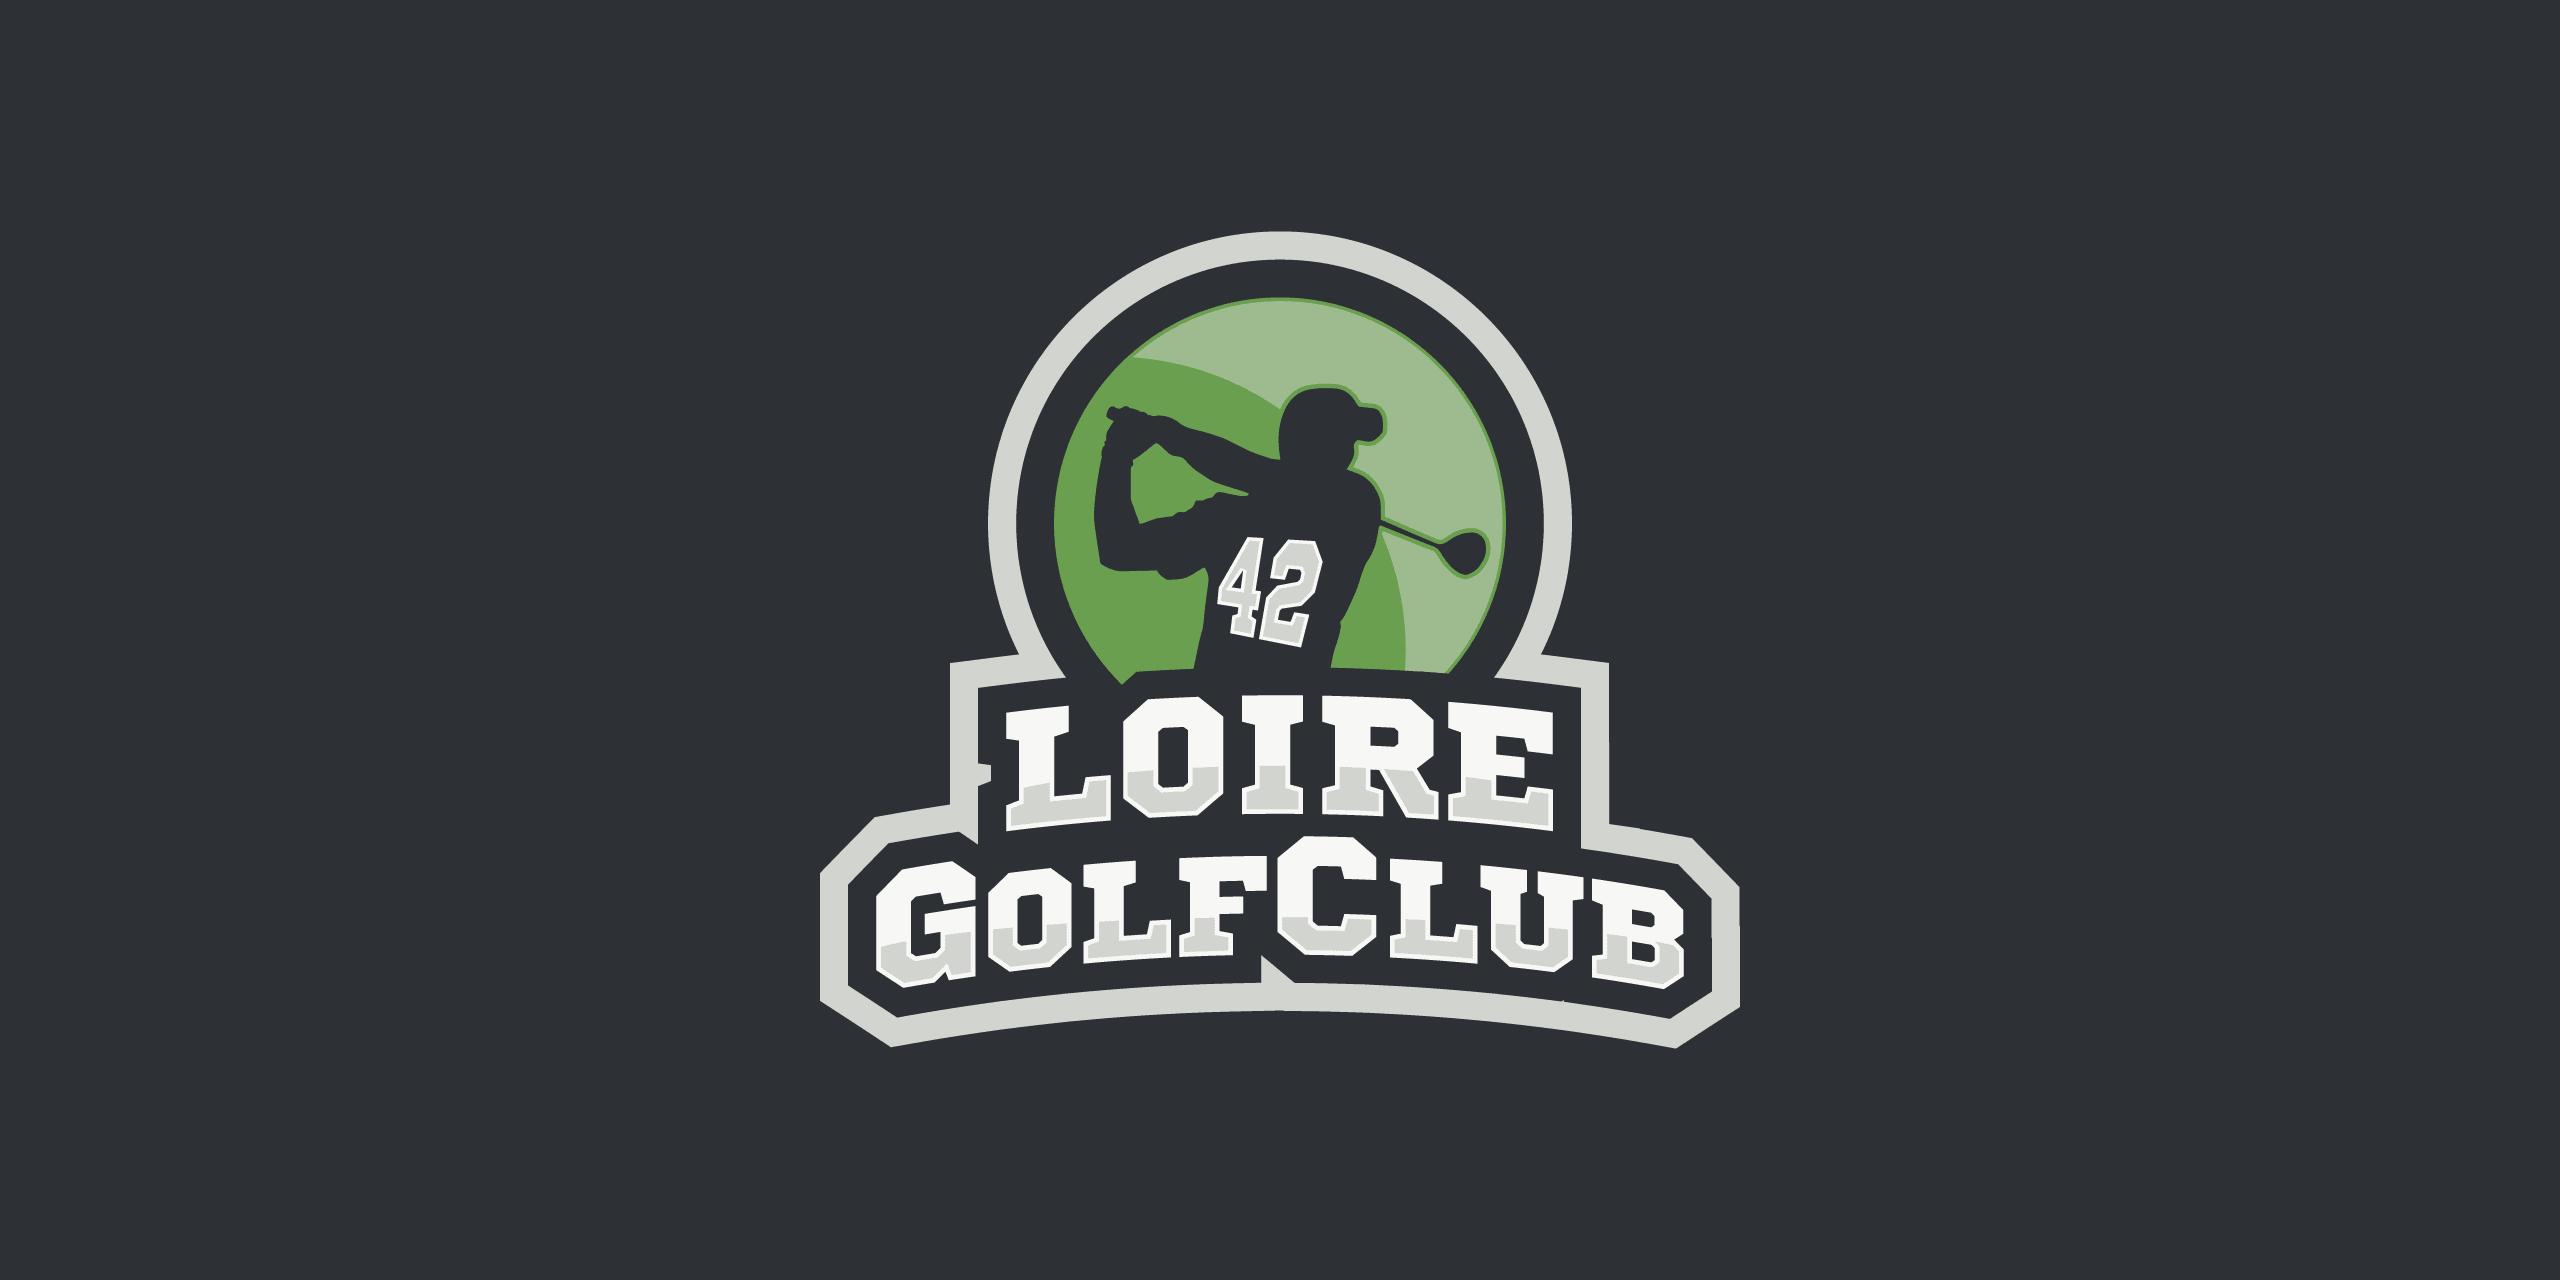 Loire Golf Club Wide